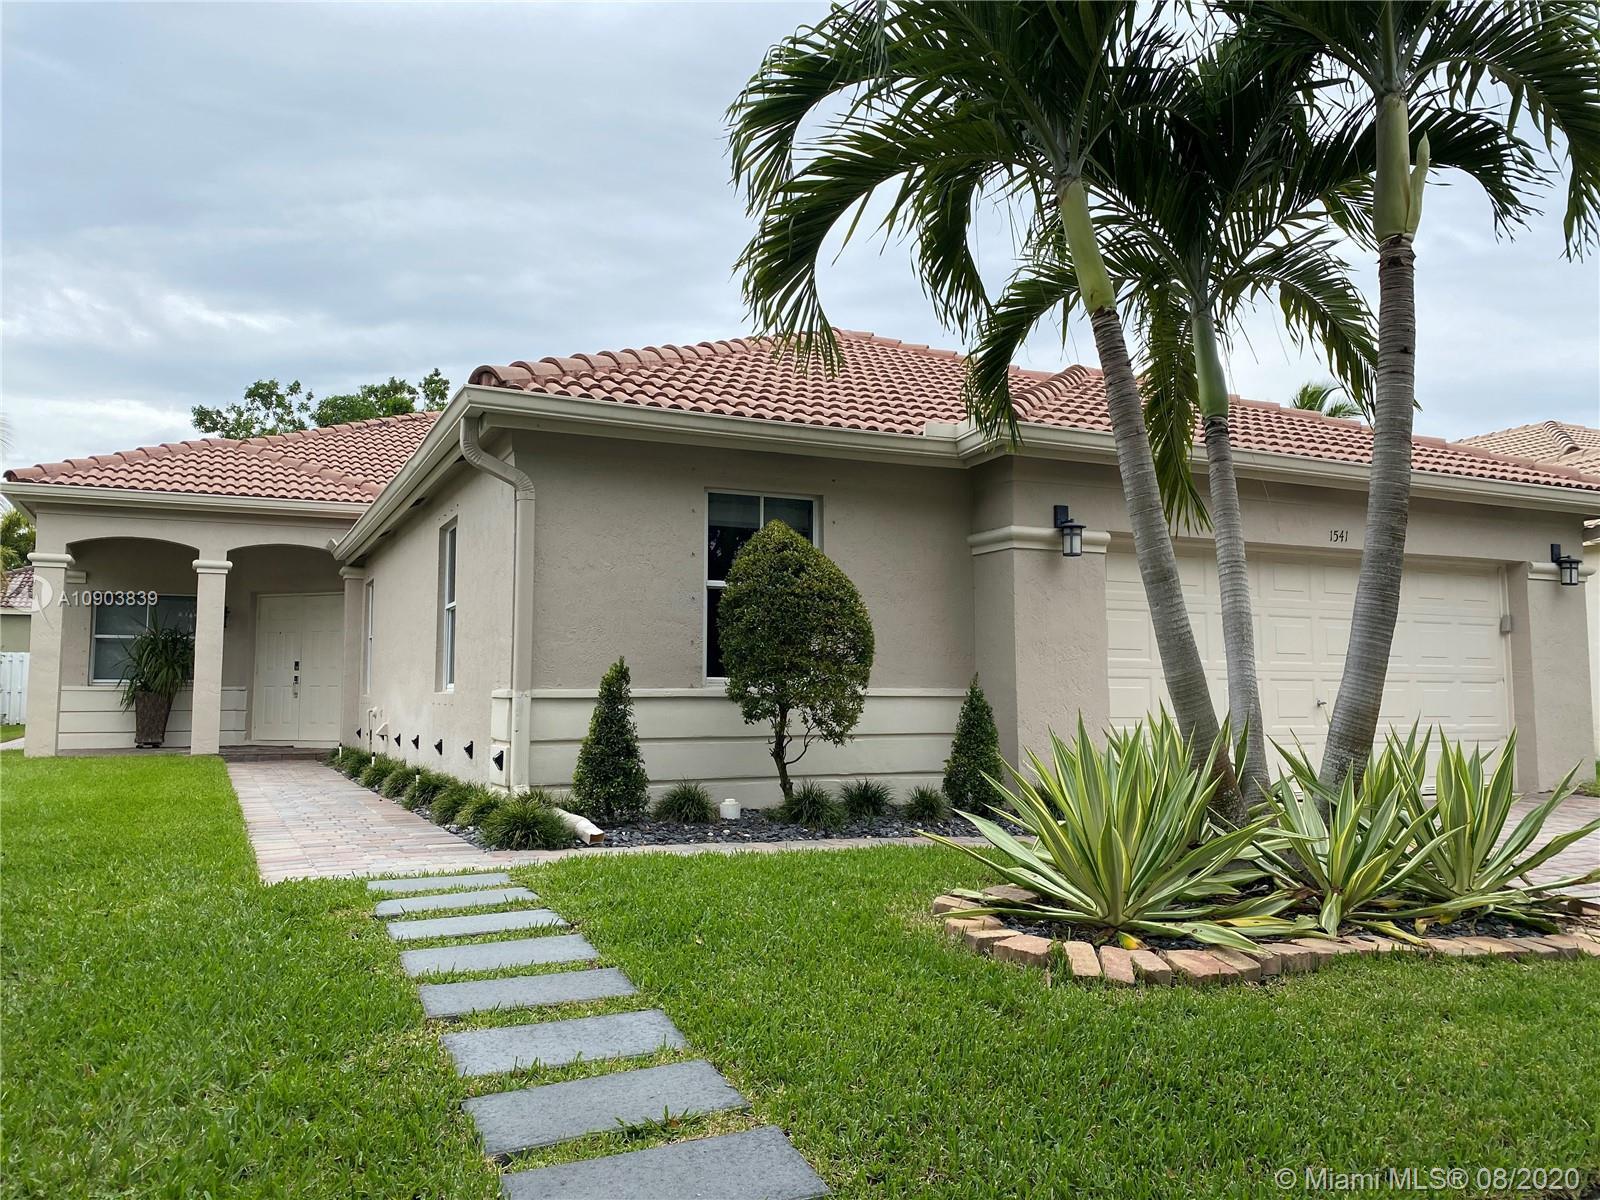 1541  Elm Grove Rd  For Sale A10903839, FL